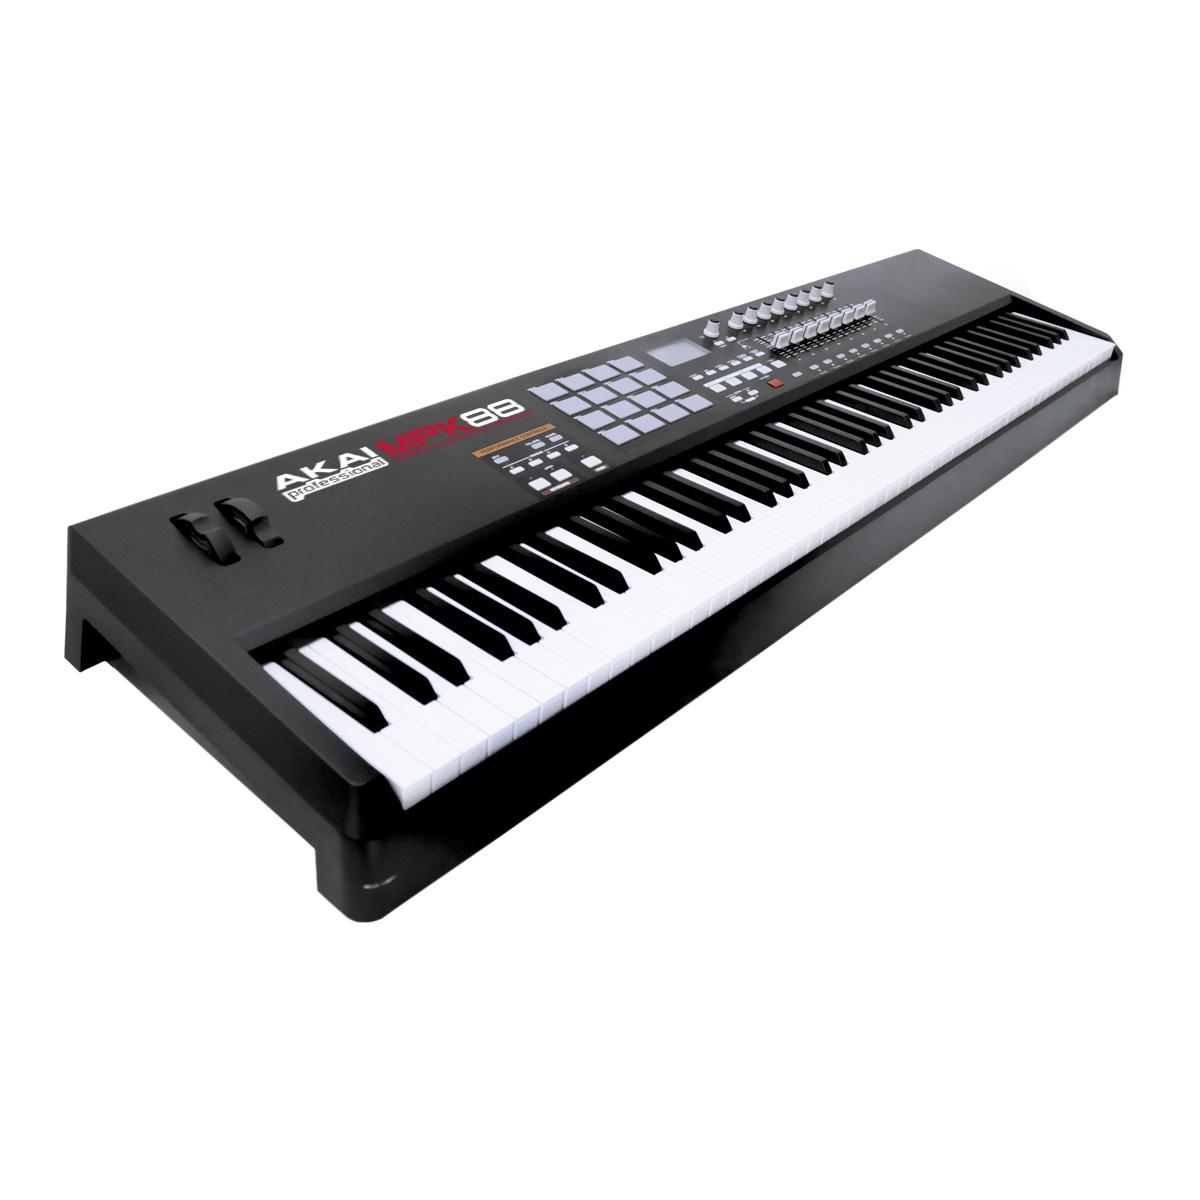 MPK88 - Teclado Controlador MIDI / USB MPK 88 - AKAI